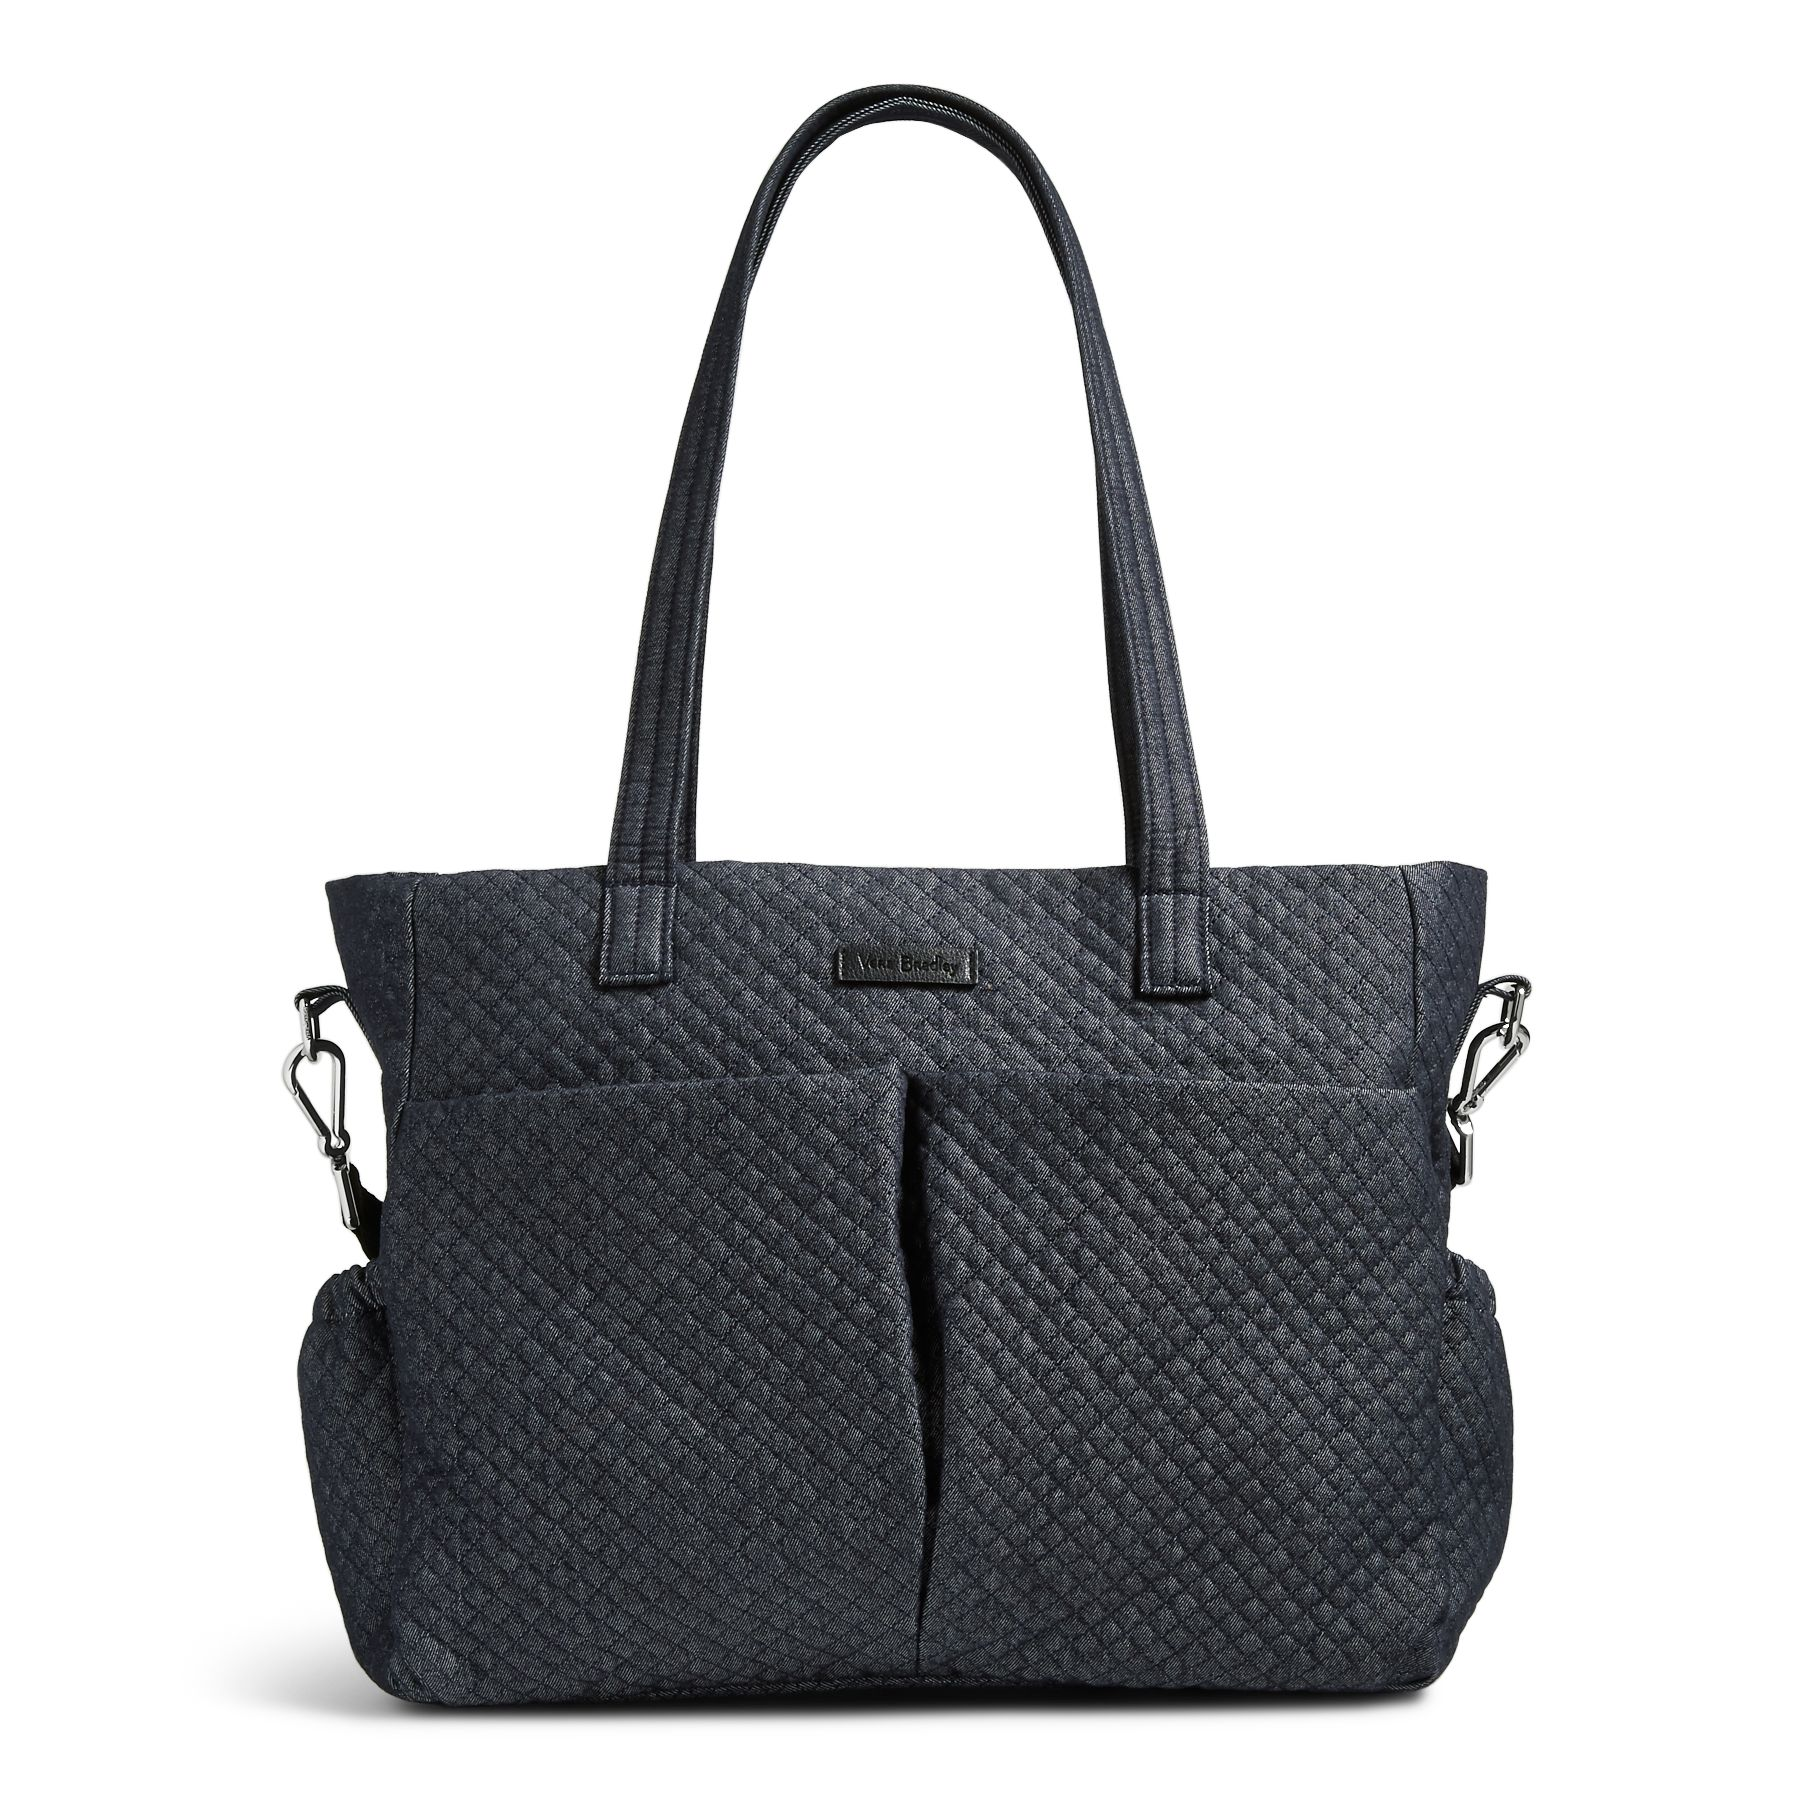 Vera Bradley Iconic Ultimate Diaper Bag